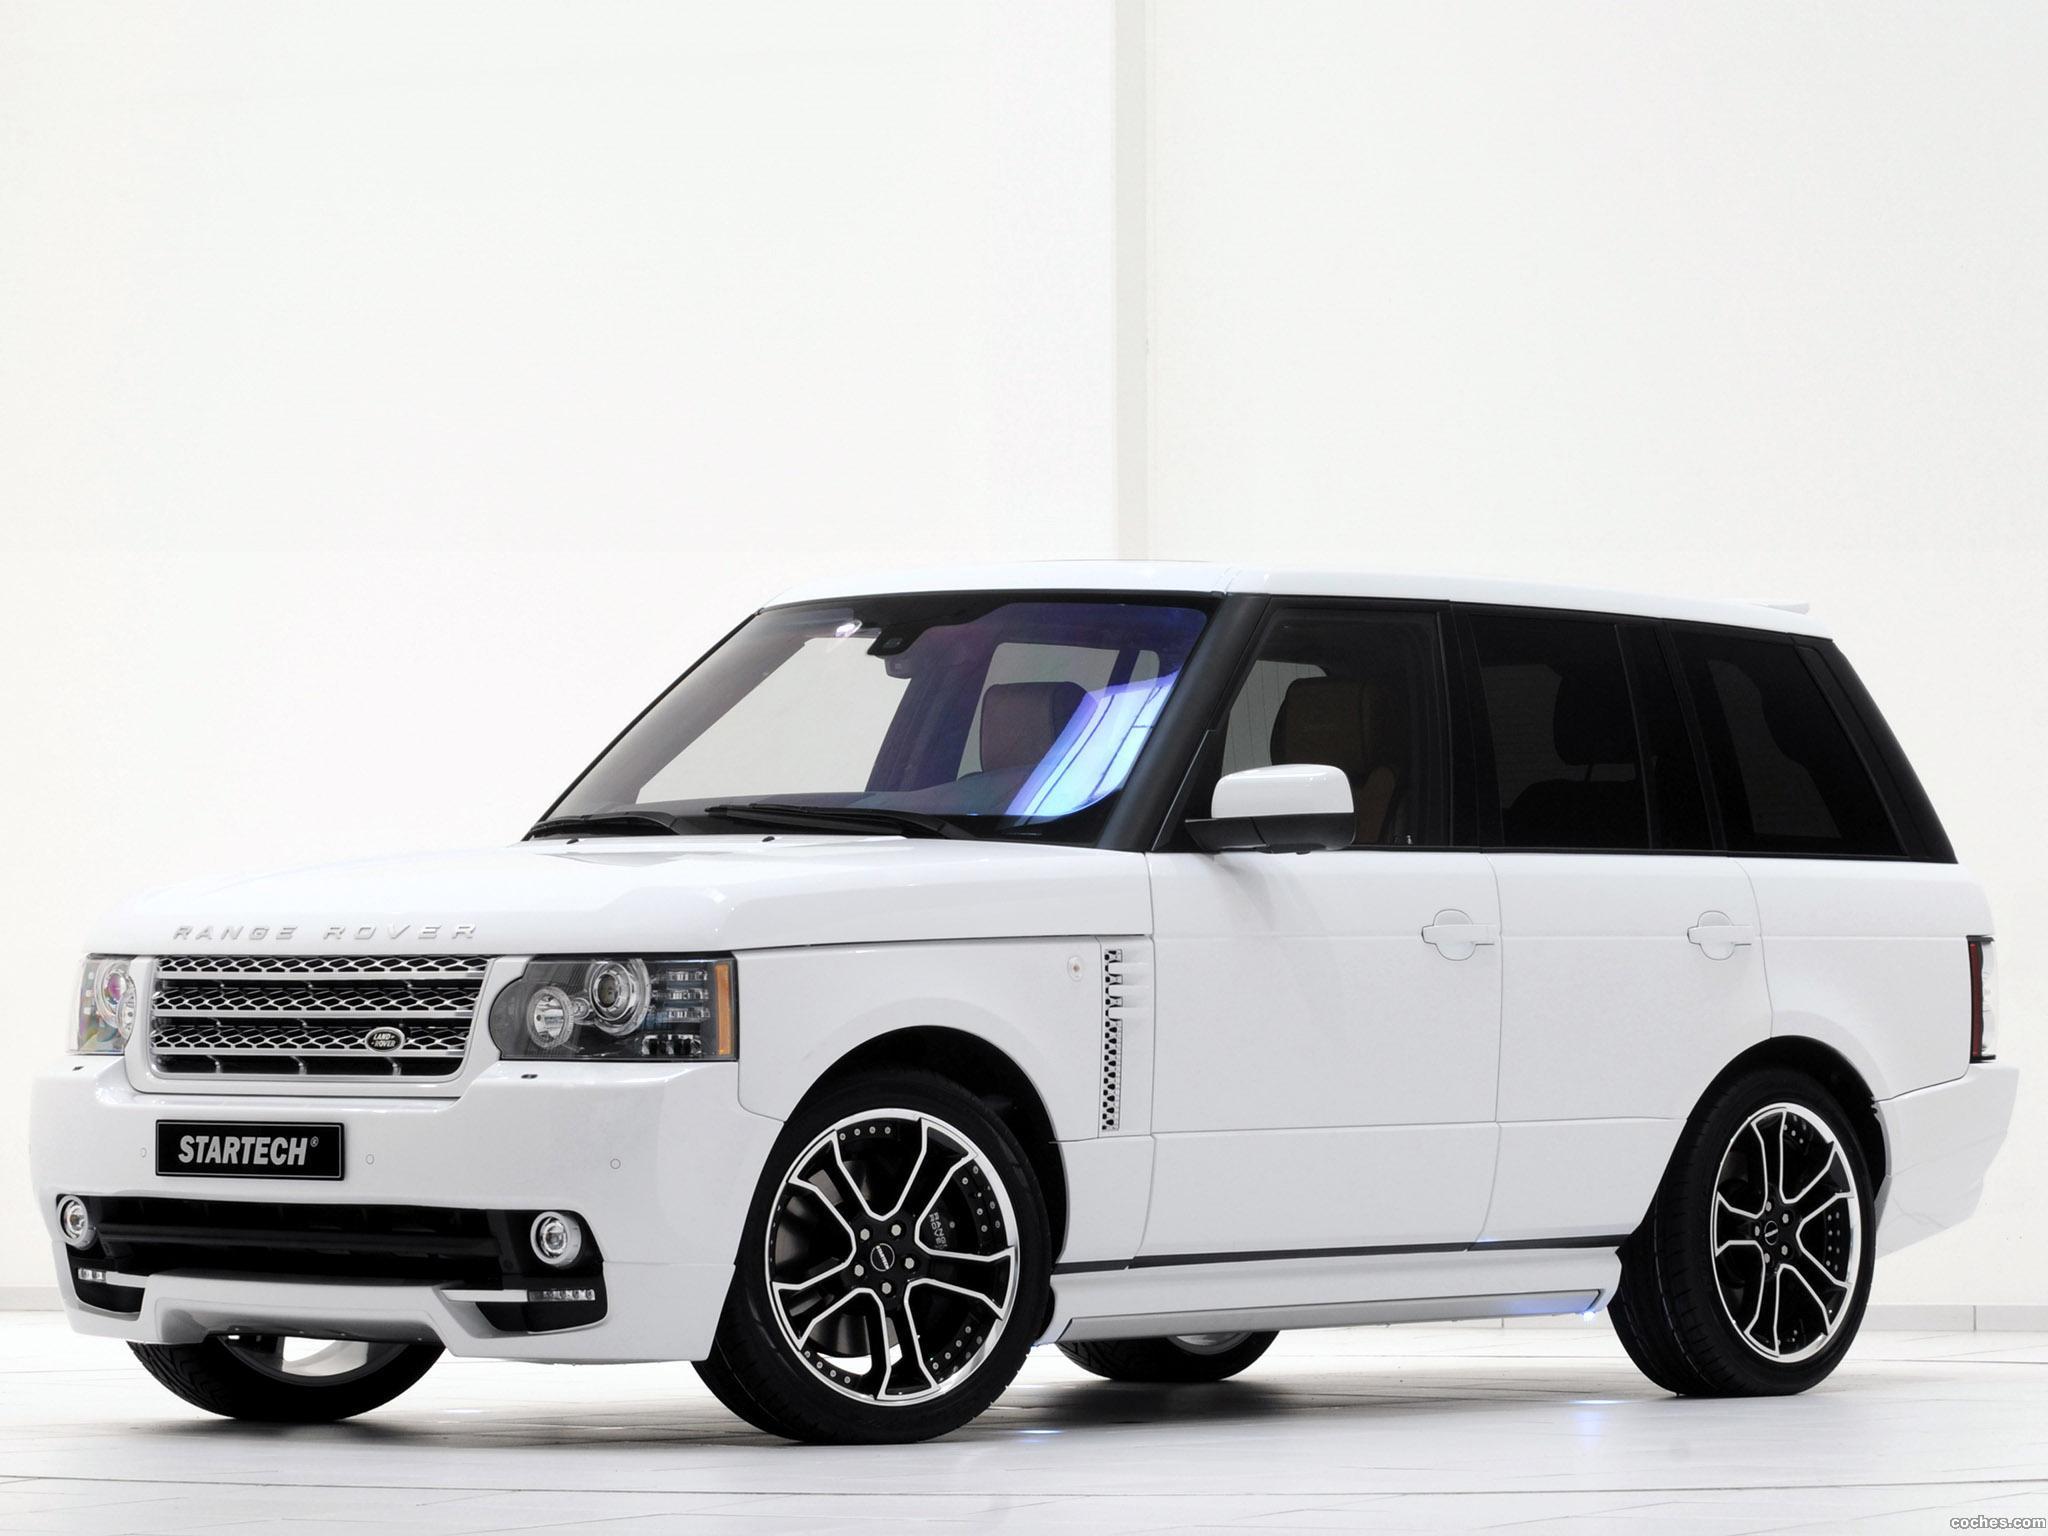 Foto 0 de StarTech Land Rover Range Rover Supercharged 2011